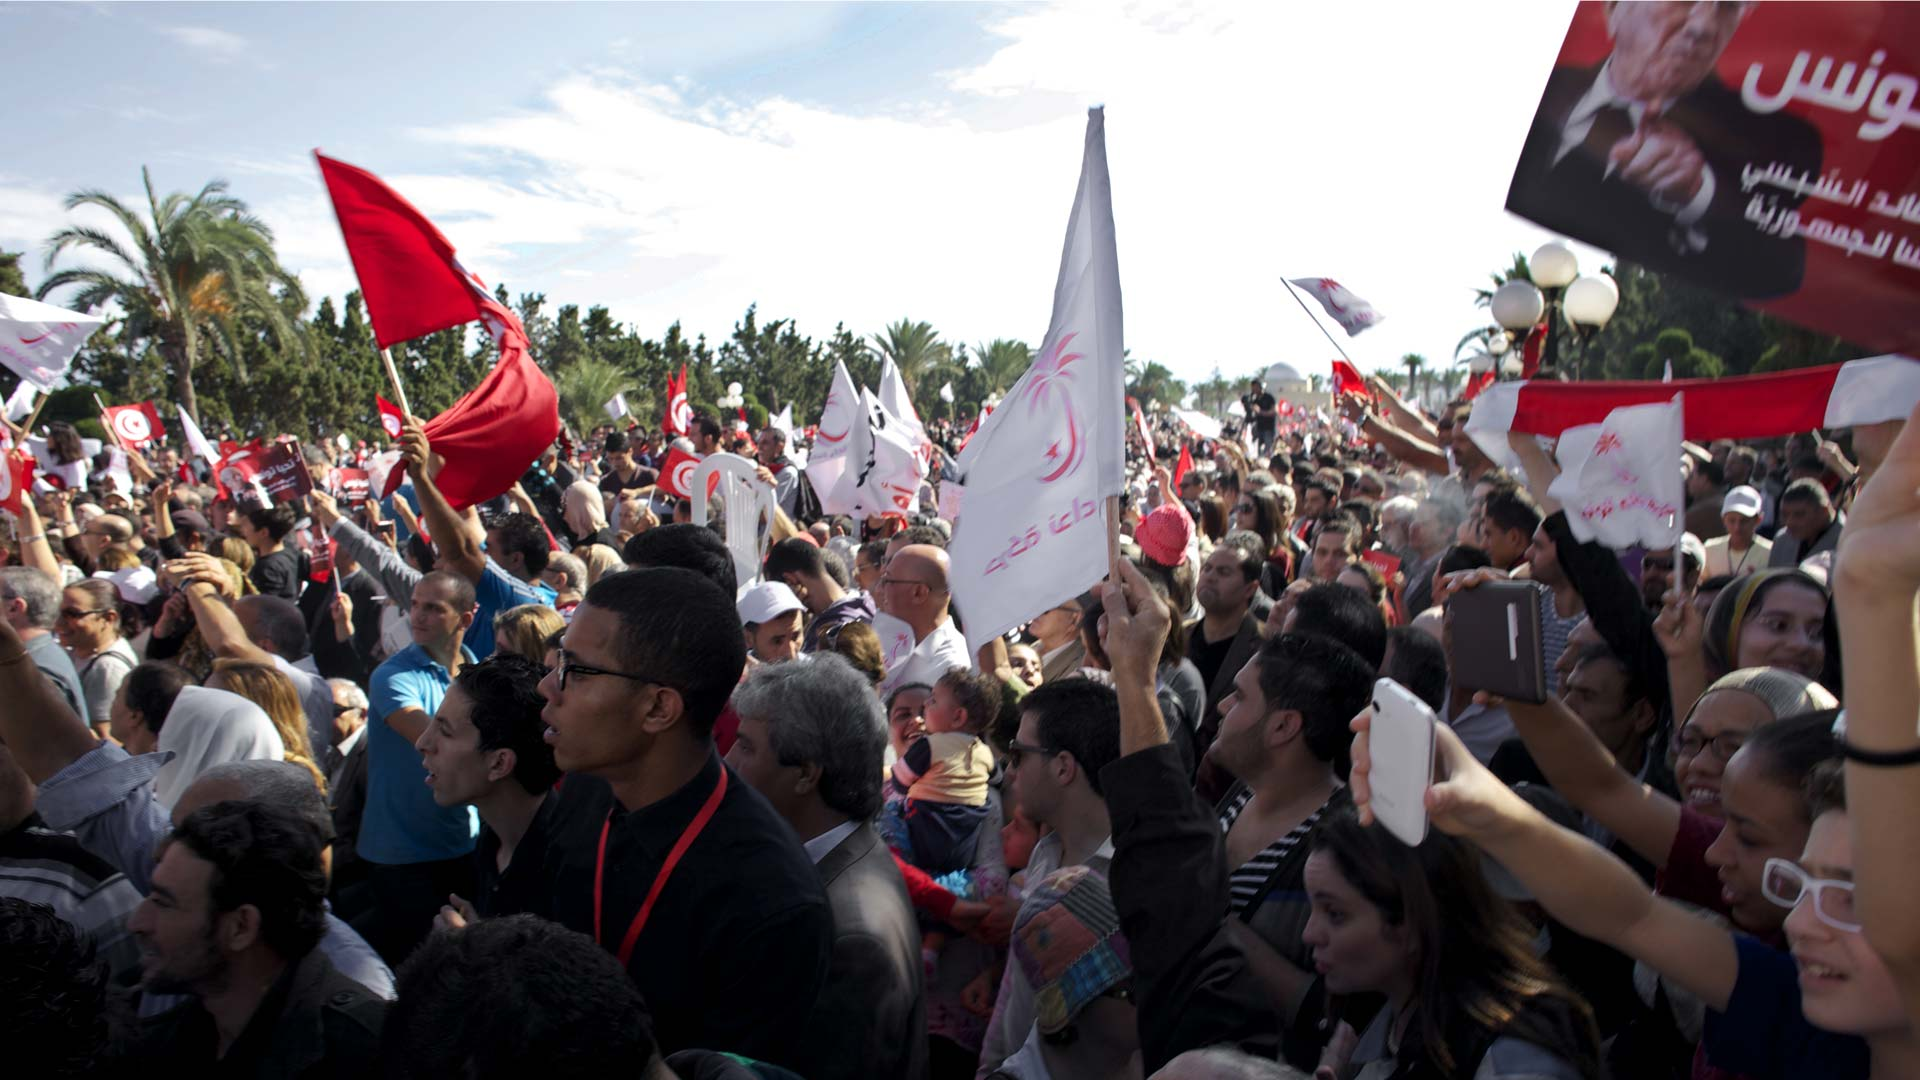 com-politique-election-tunisie-foule-bce-1920-inkyfada